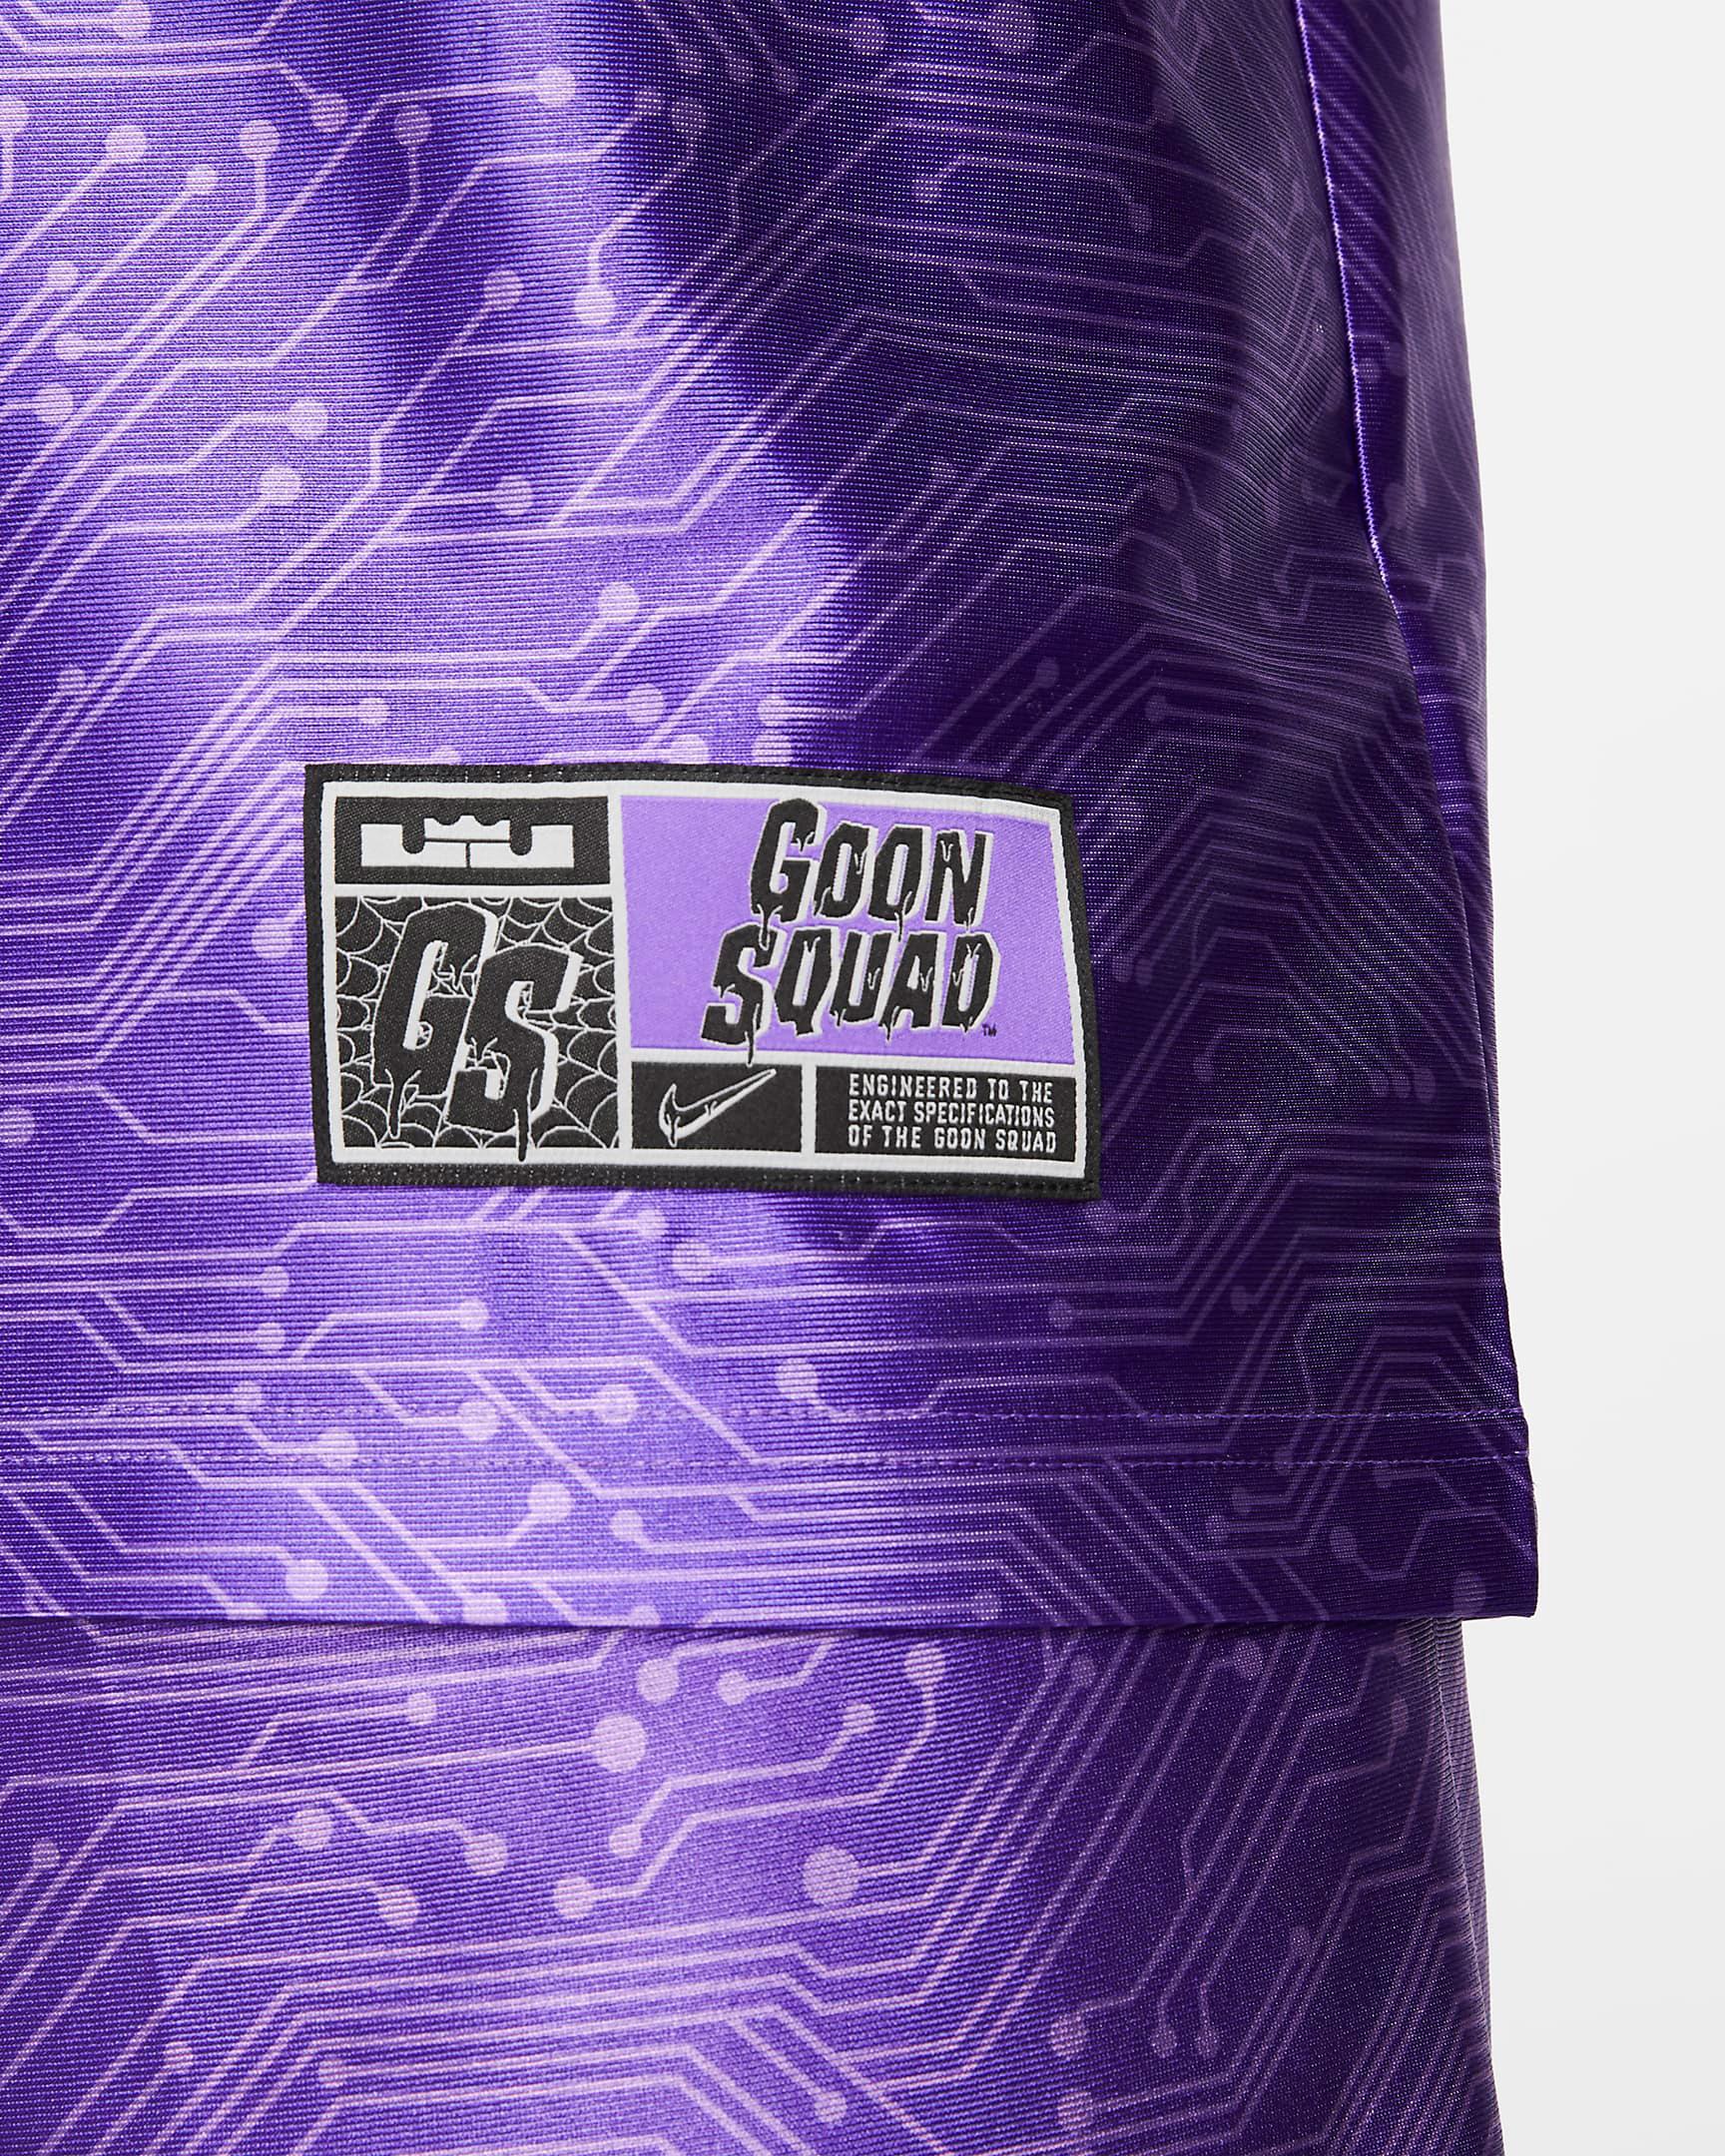 nike-lebron-space-jam-goon-squad-jersey-4